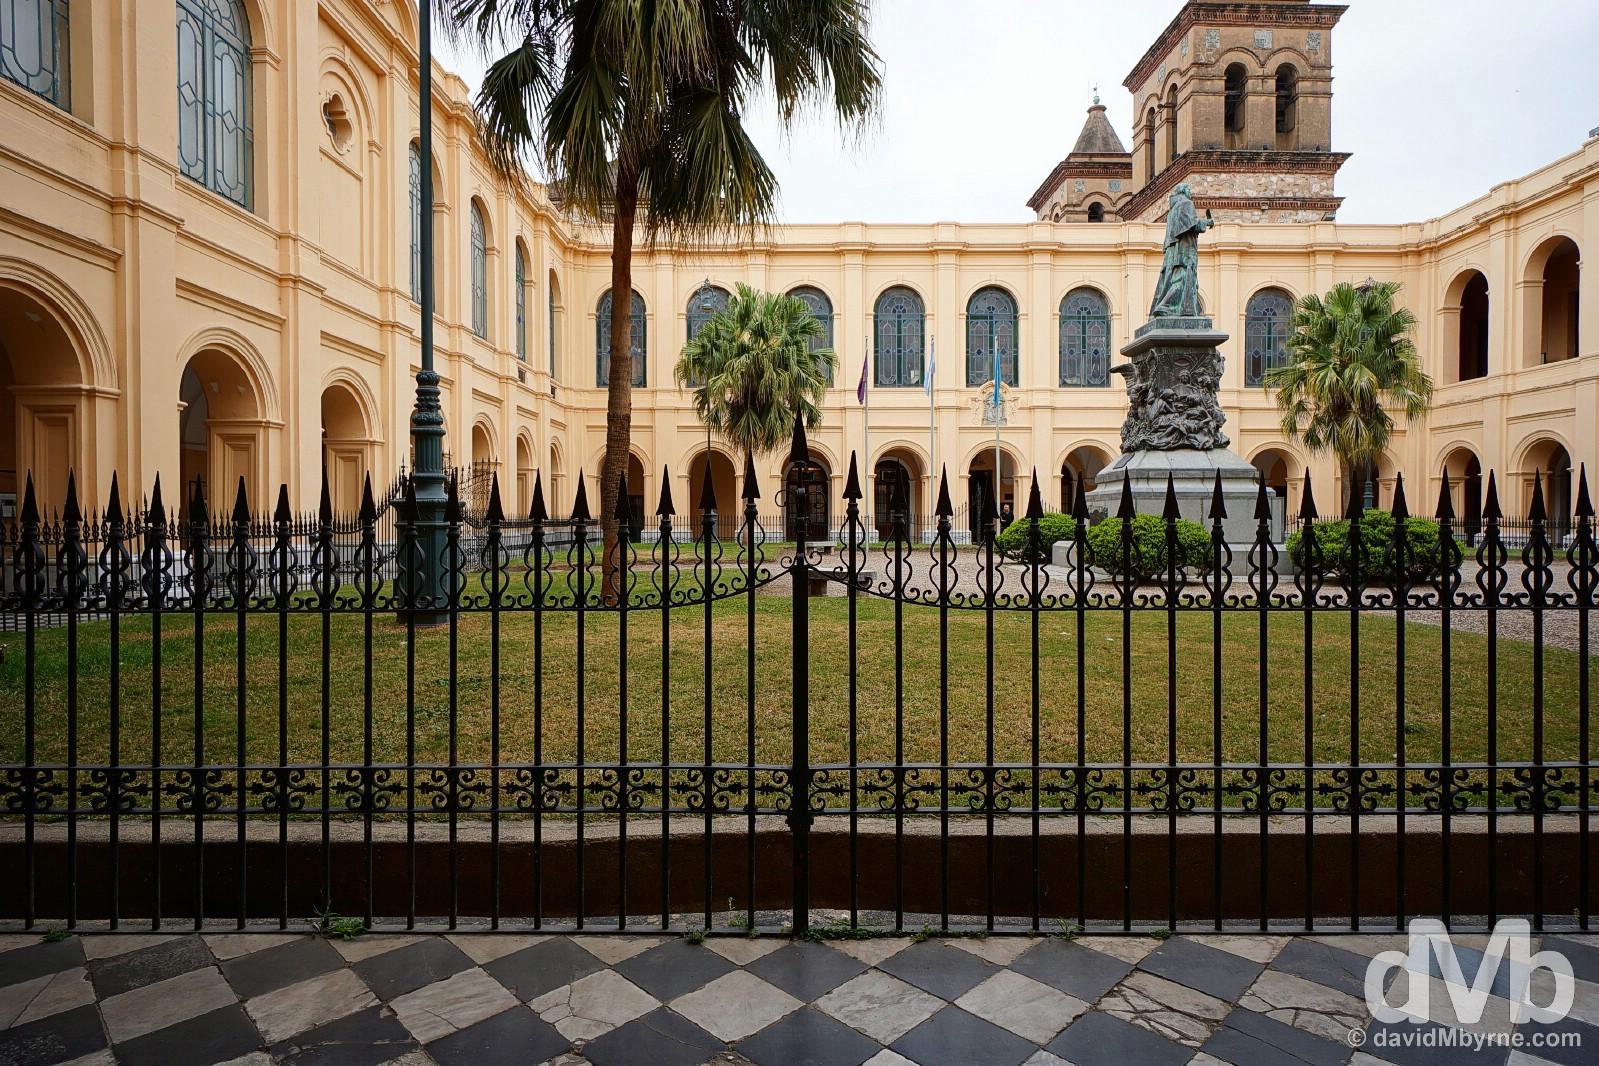 Manzana Jesuitica in Cordoba, Argentina. September 23, 2015.